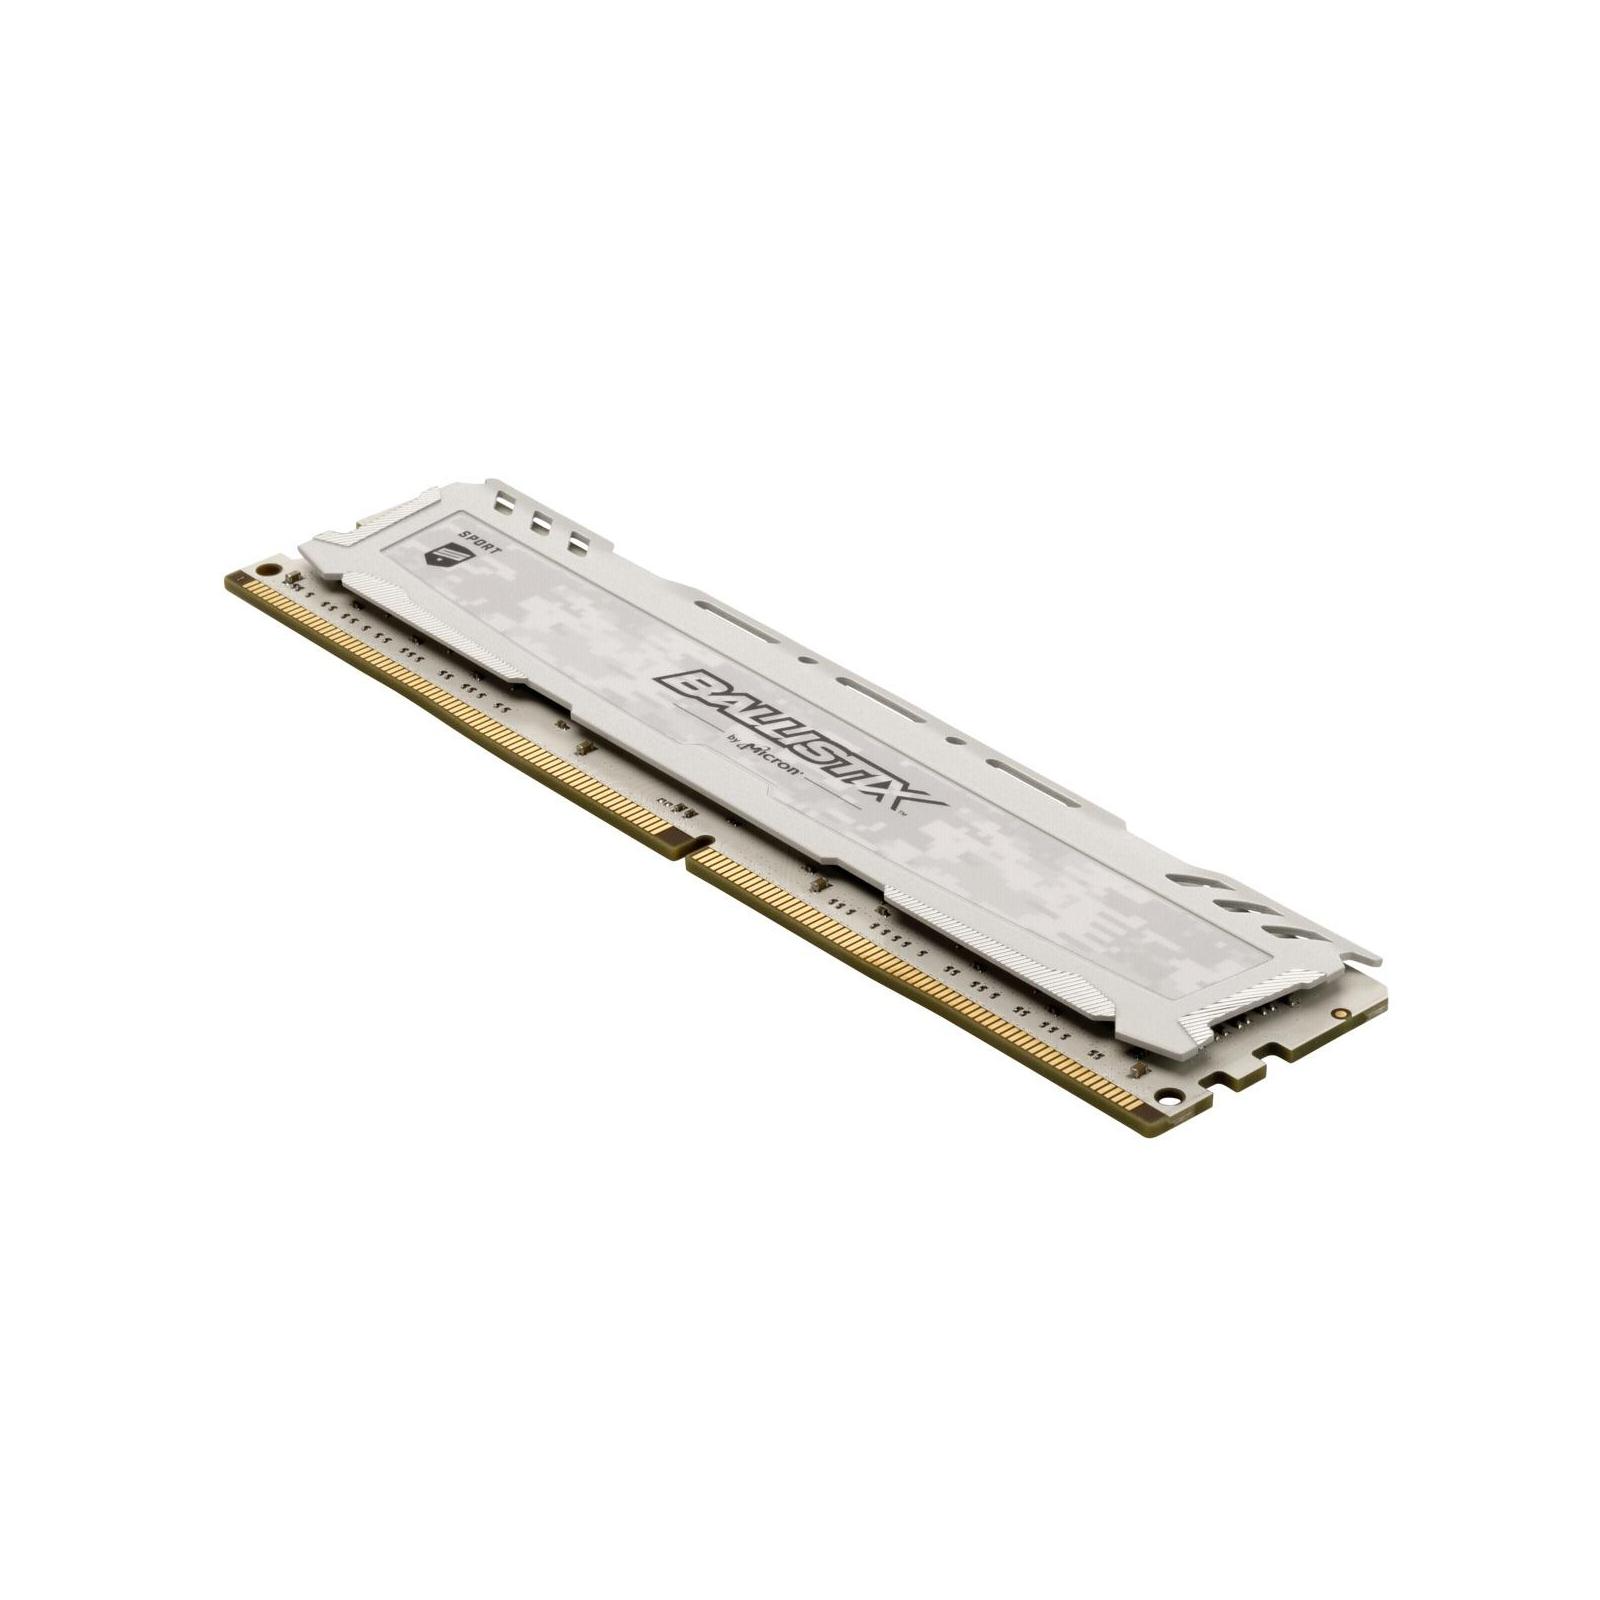 Модуль памяти для компьютера DDR4 16GB (2x8GB) 2666 MHz Ballistix Sport LT Micron (BLS2C8G4D26BFSCK) изображение 3